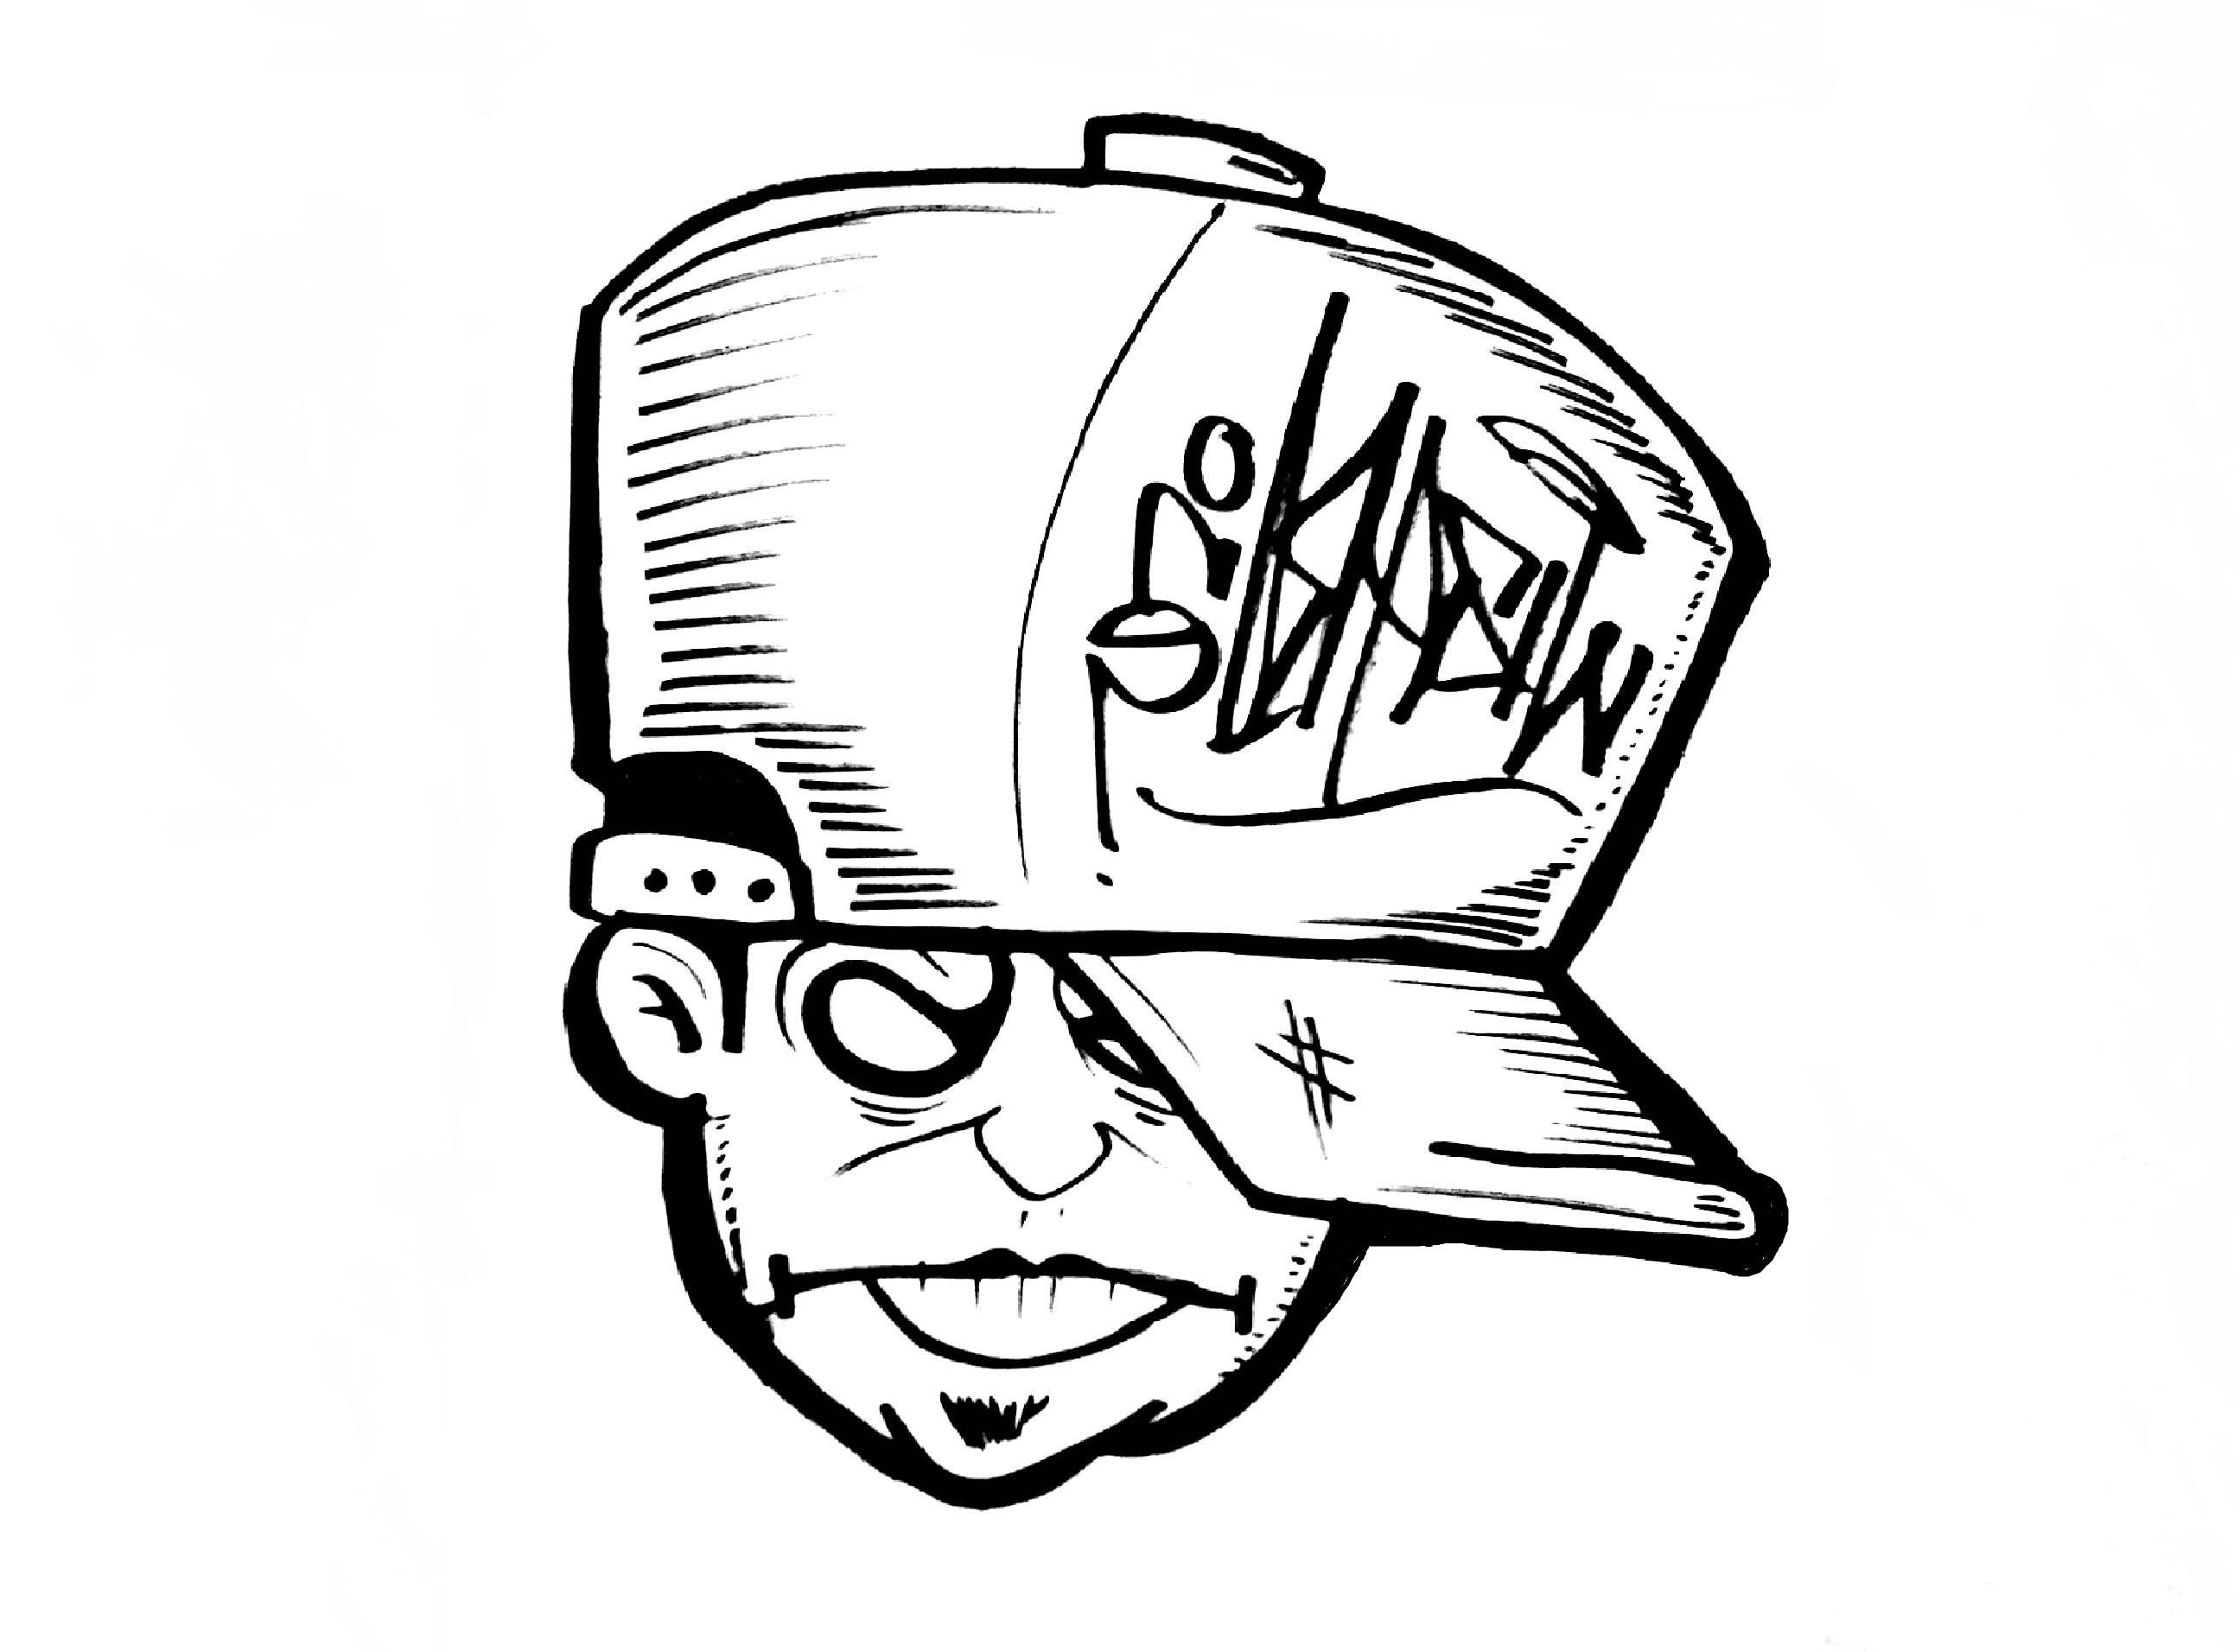 2592x1912 Graffiti Character Joker Sketch How To Draw Face (Graffiti